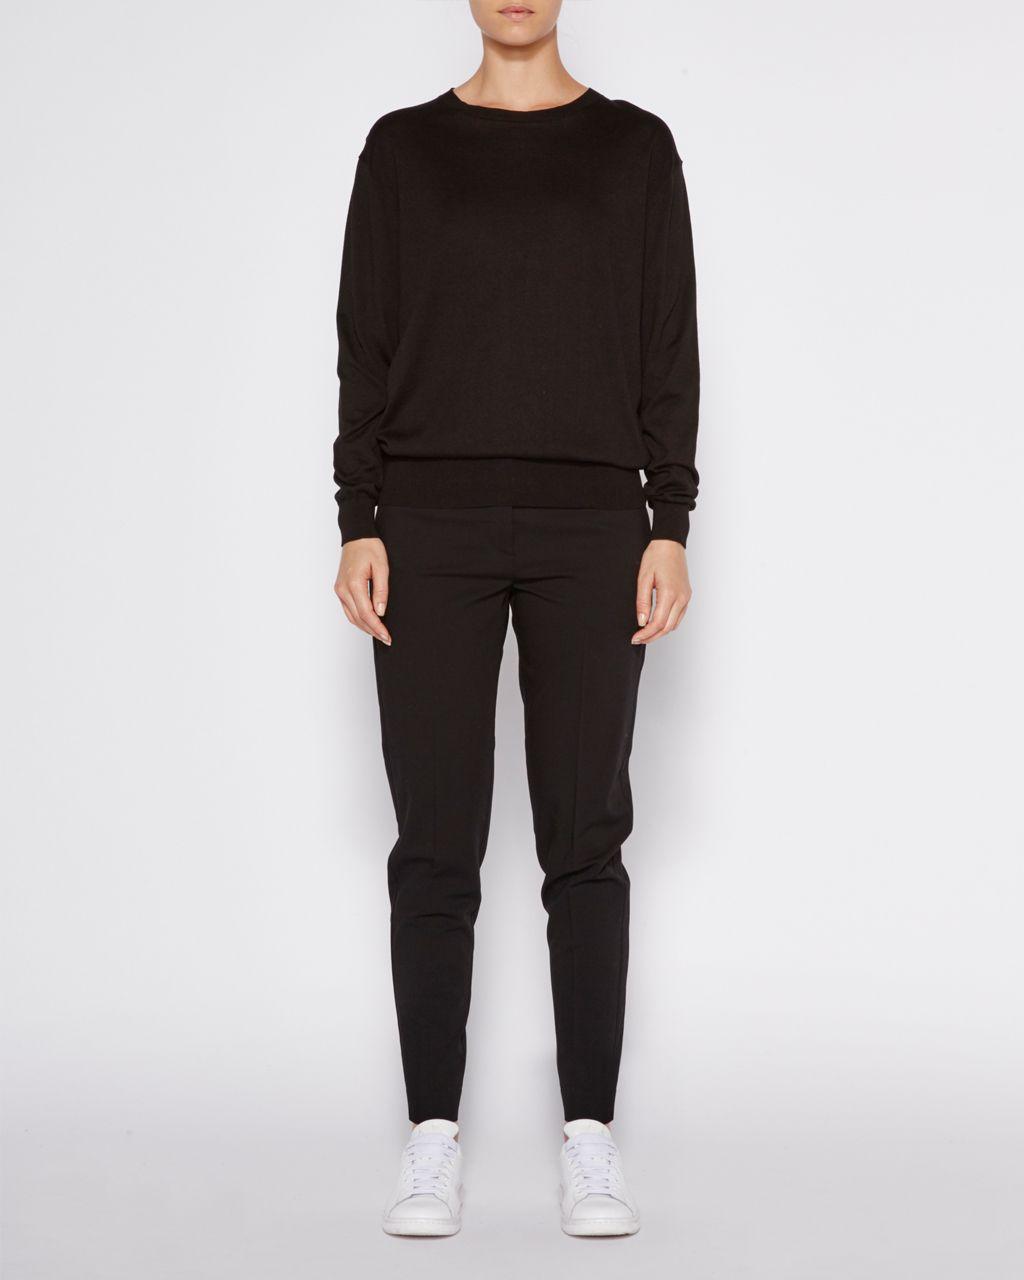 Jac+ Jack | Cotton crew neck sweater.